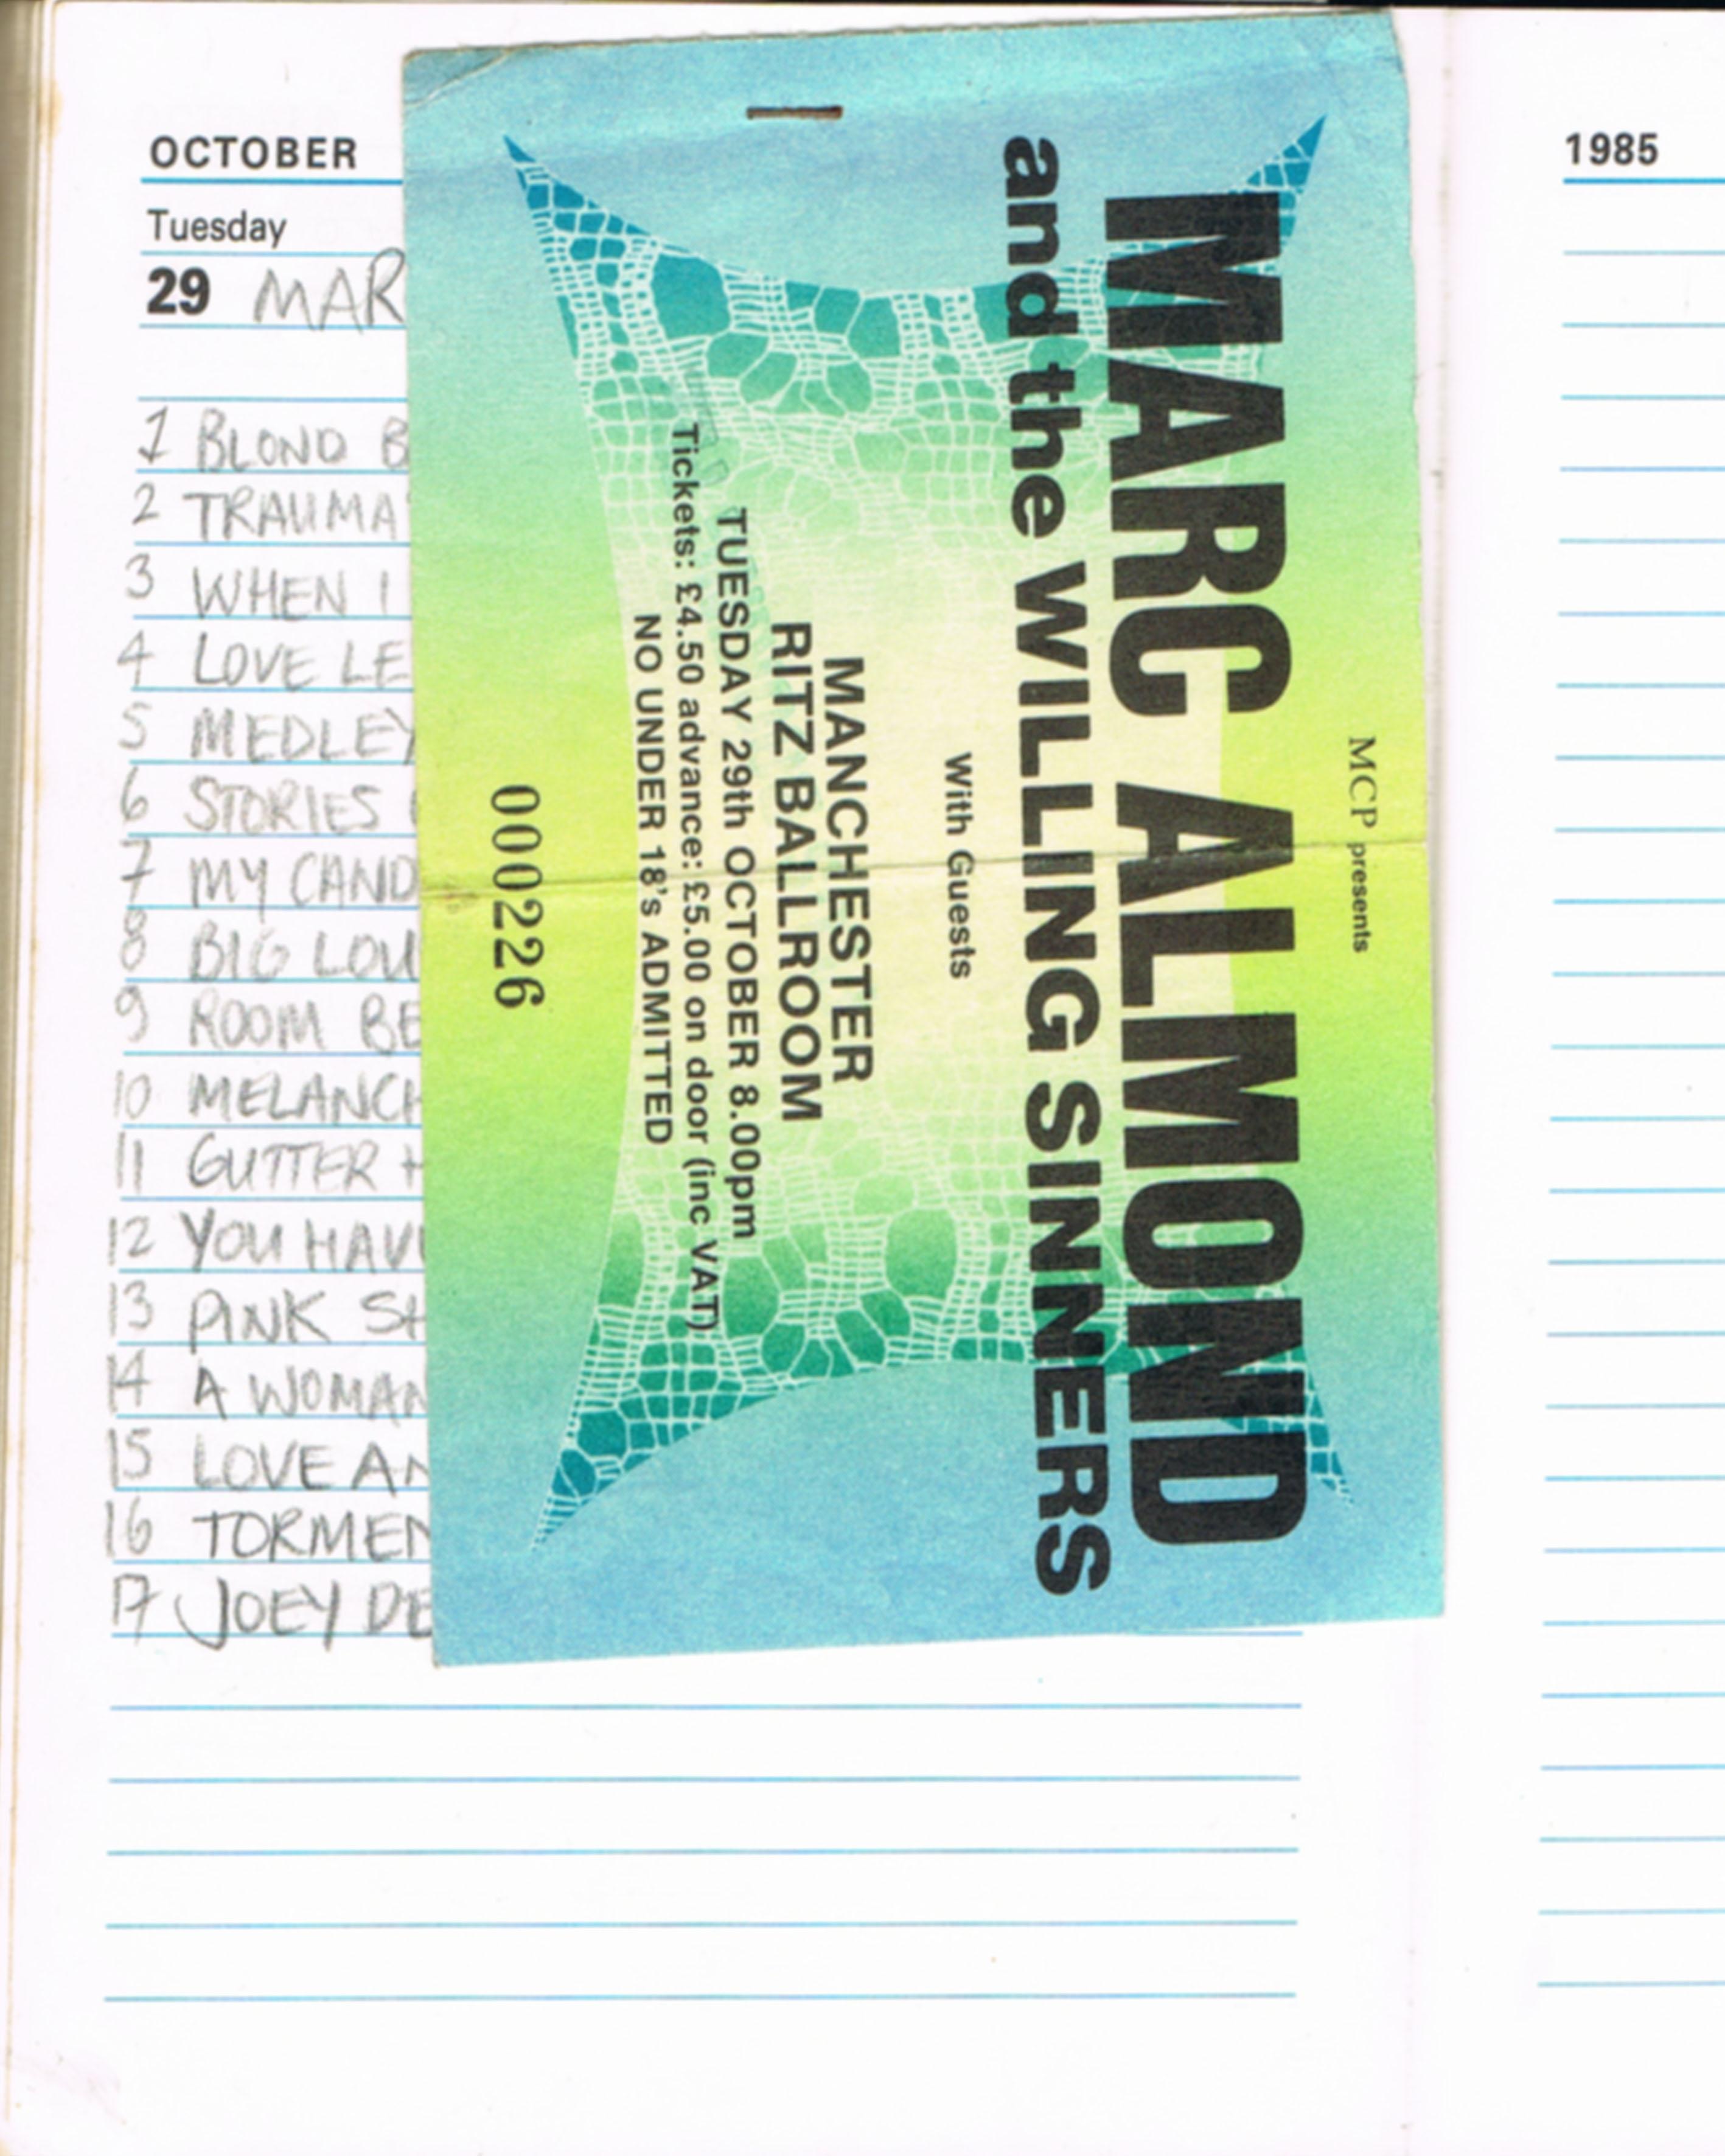 MarcAlmondAndTheWillingSinners1985-10-29TheRitzManchesterUK.jpg